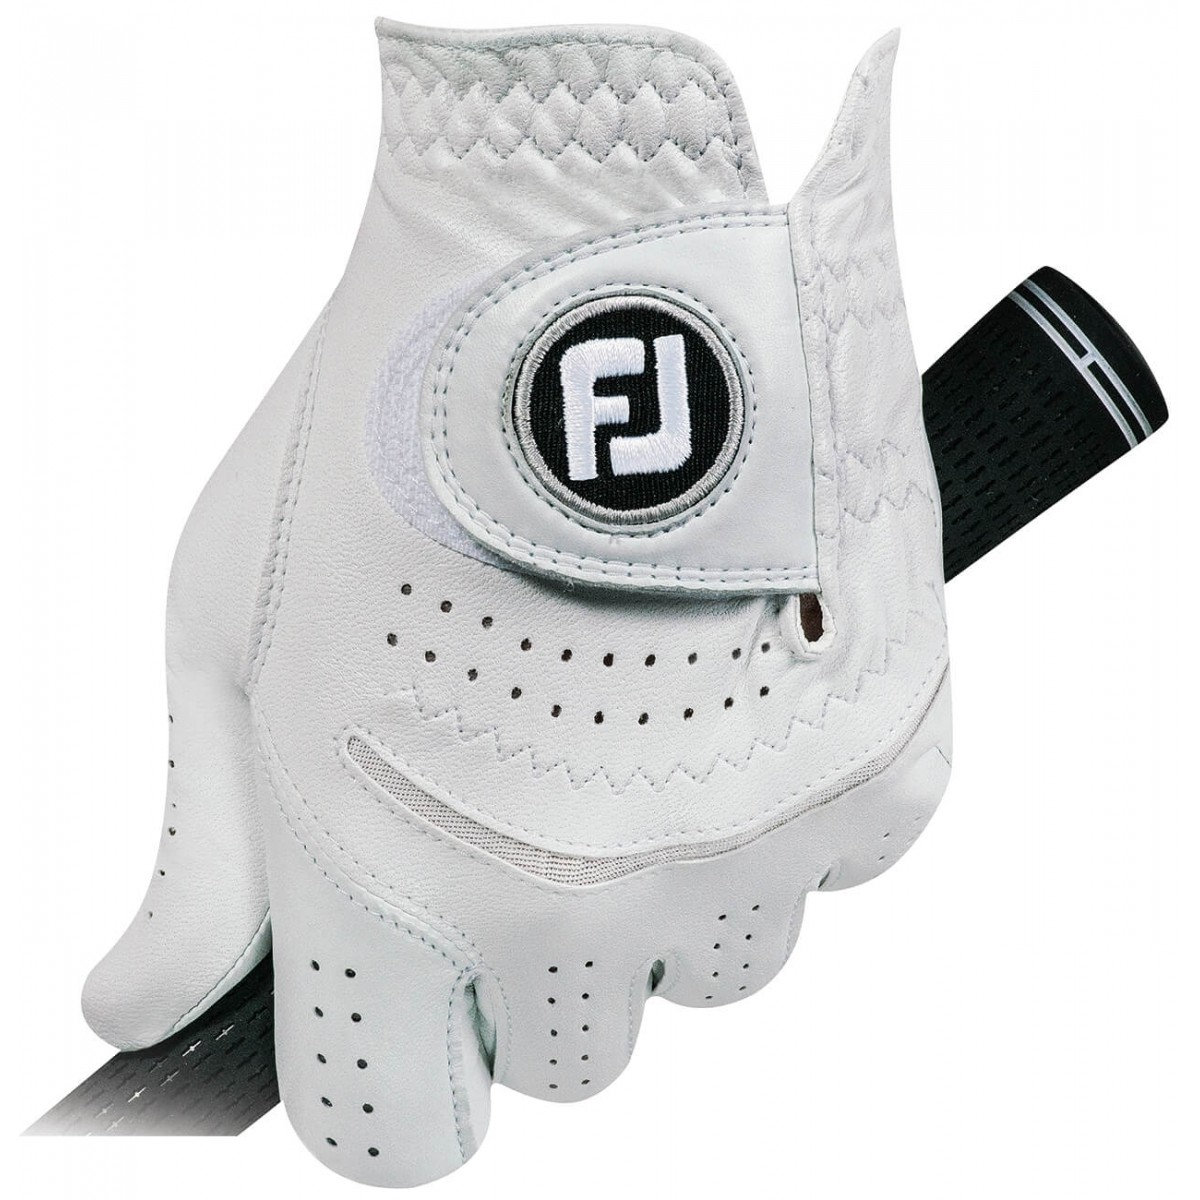 FootJoy Men's 2020 Contour FLX Golf Glove - Right Hand Regular